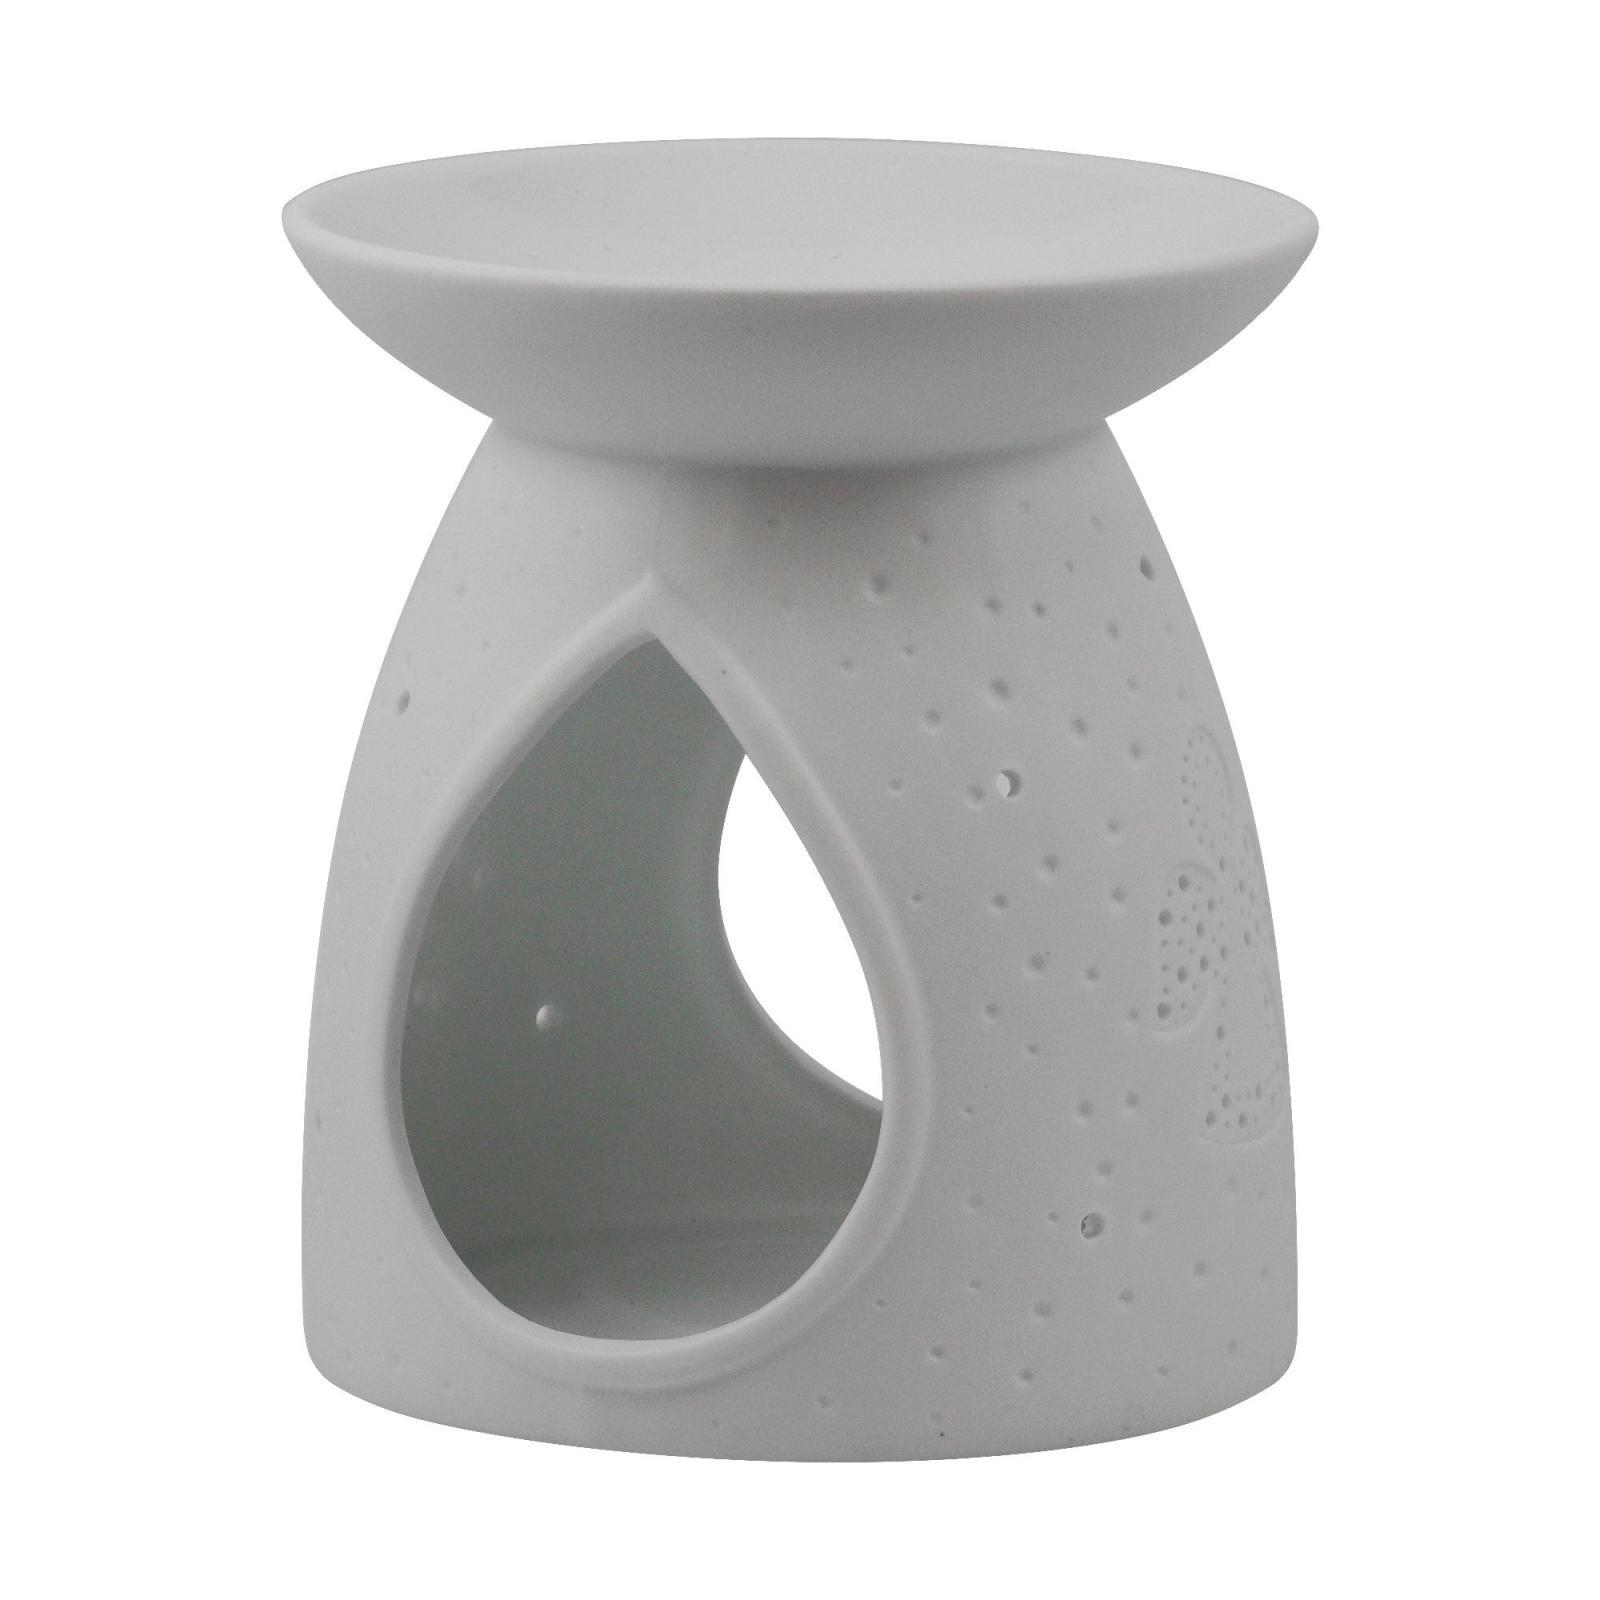 Kerzenfarm Porcelánová aromalampa Anděl 1 ks, 11 cm